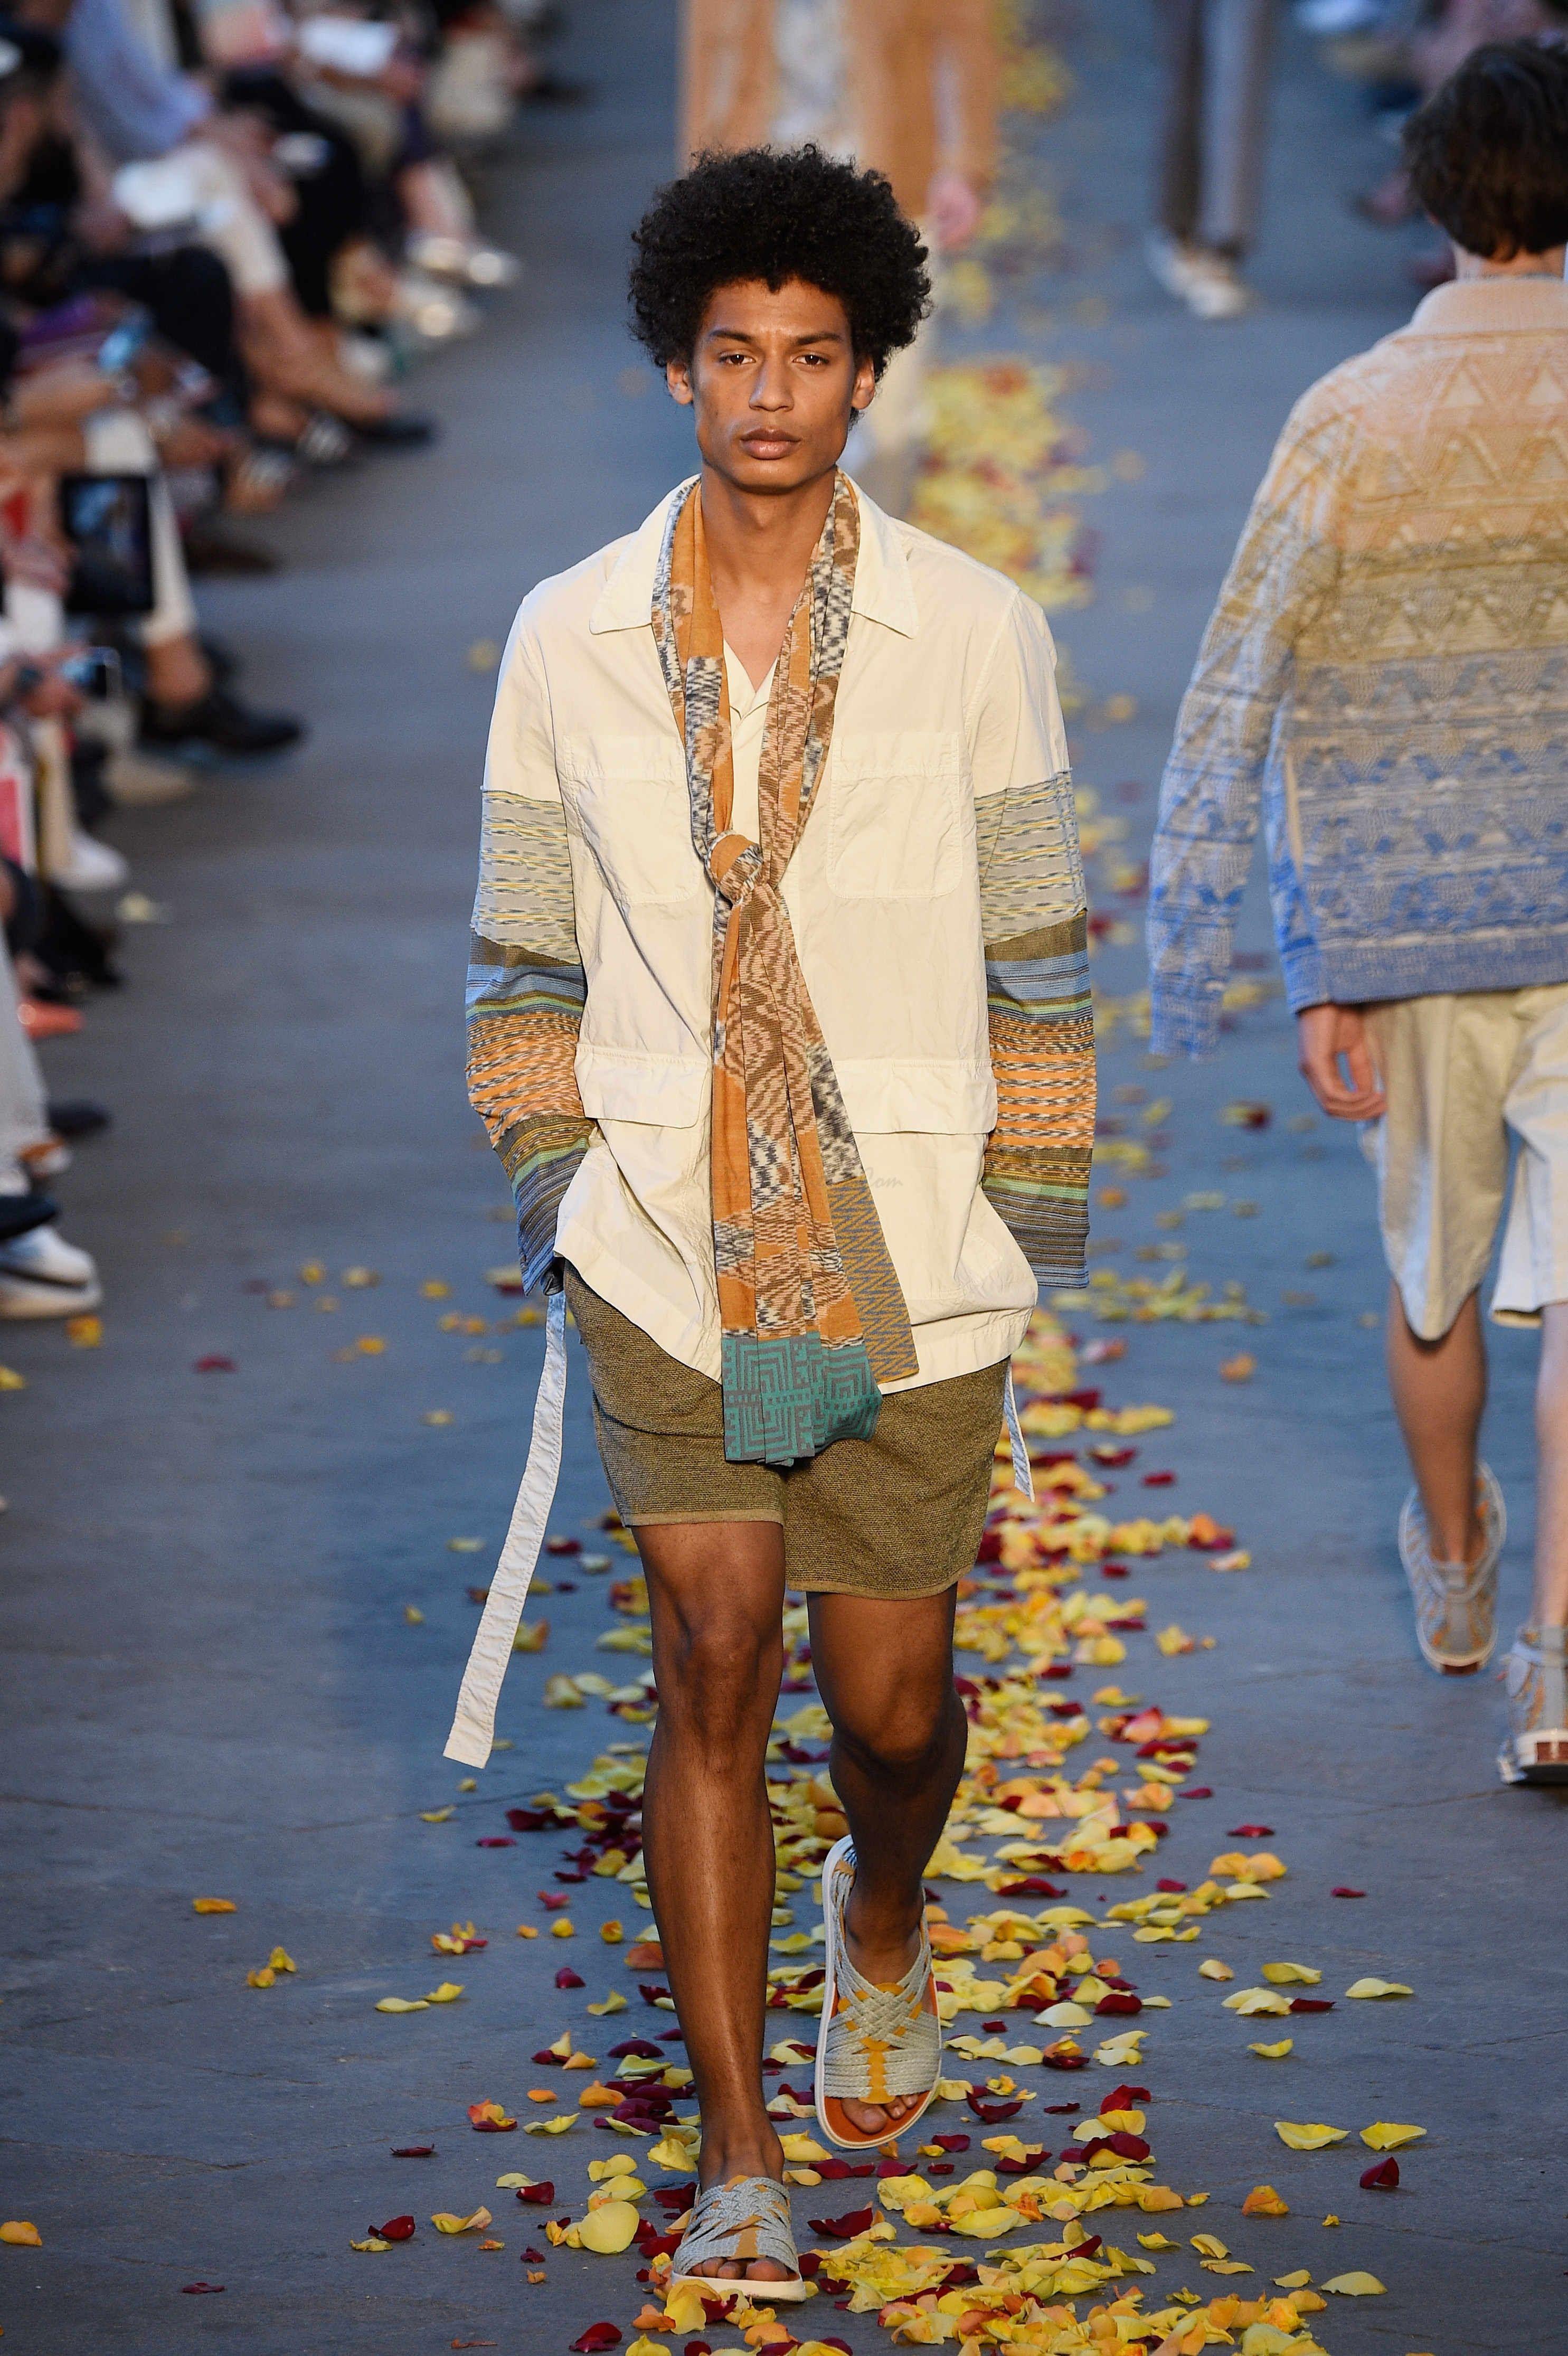 Missoni Spring Summer 2016 Primavera Verano Collection #Menswear #Trends #Tendencias #Moda Hombre- Milan Fashion Week - D.P.